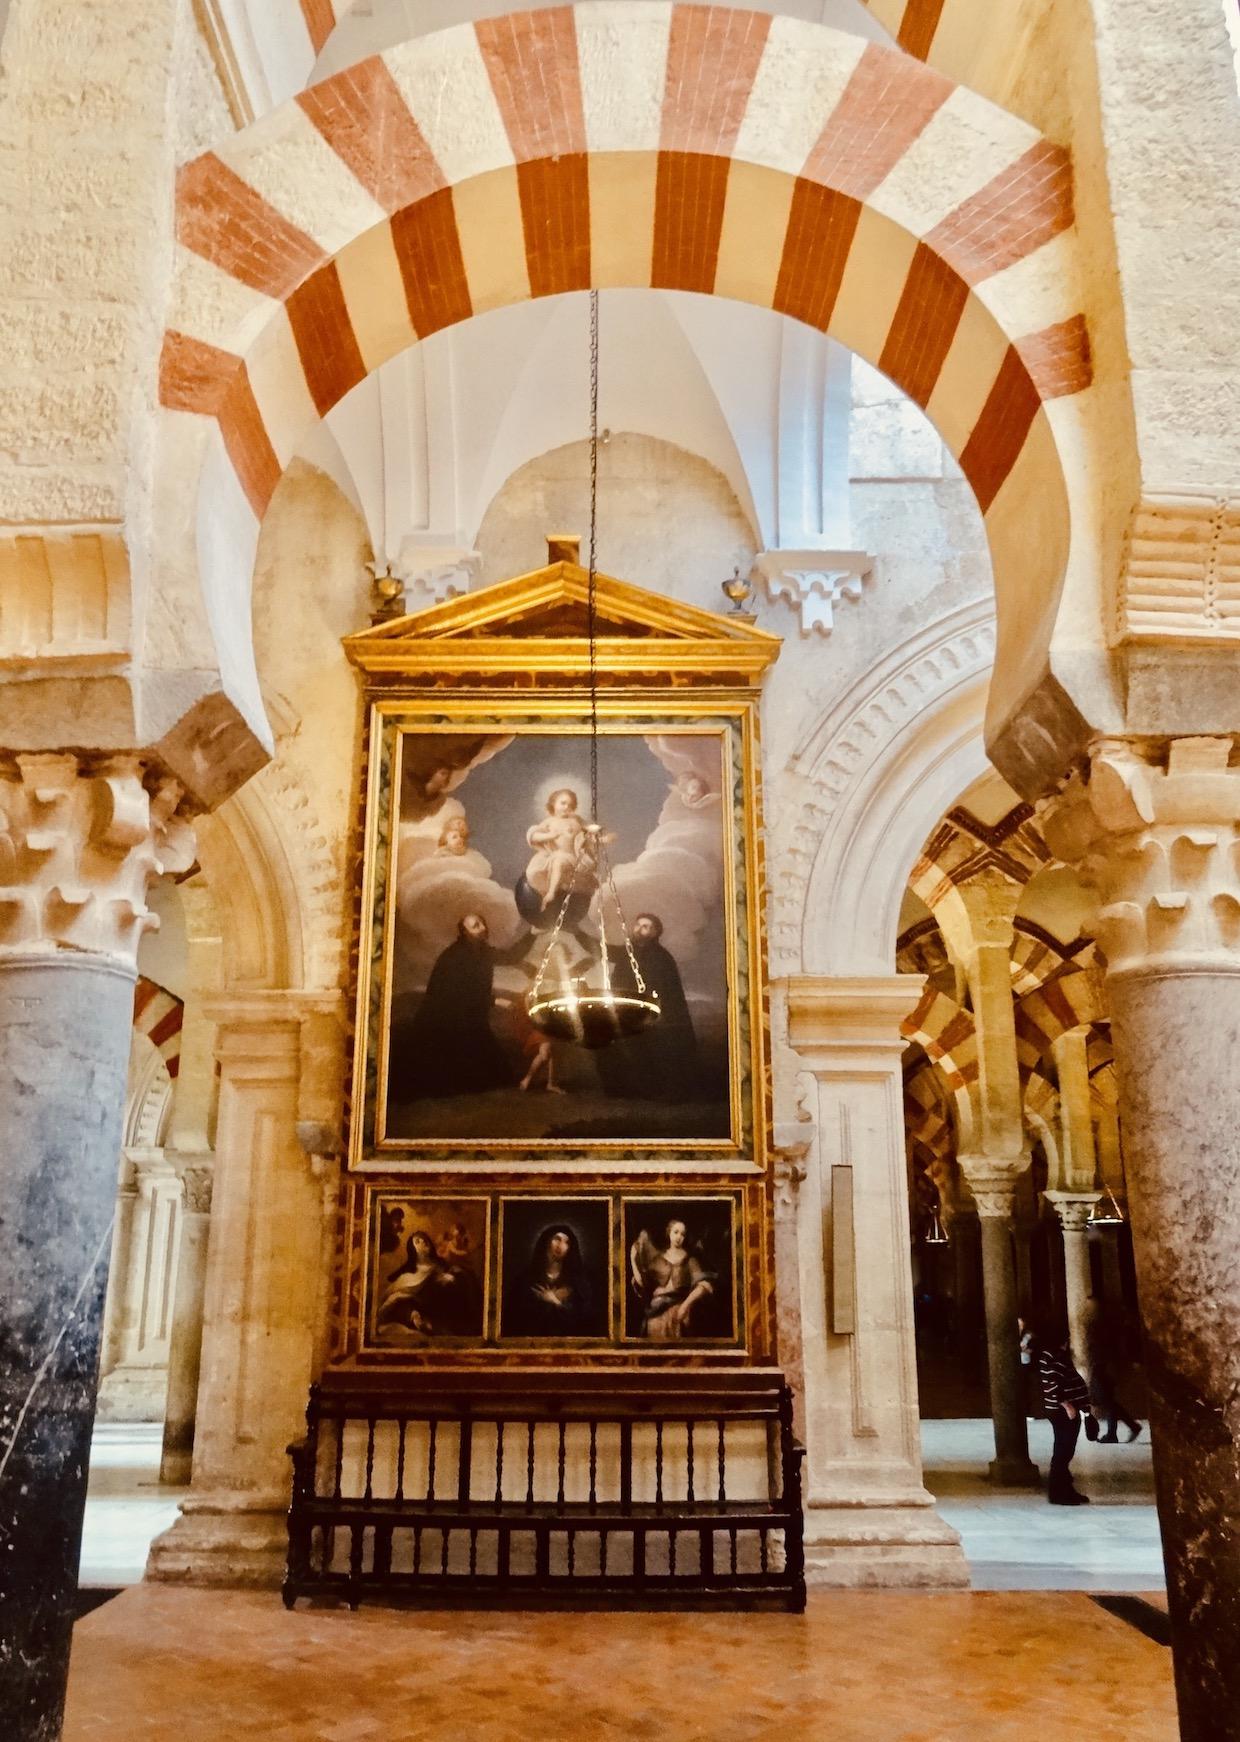 Mezquita Cordoba Spain.